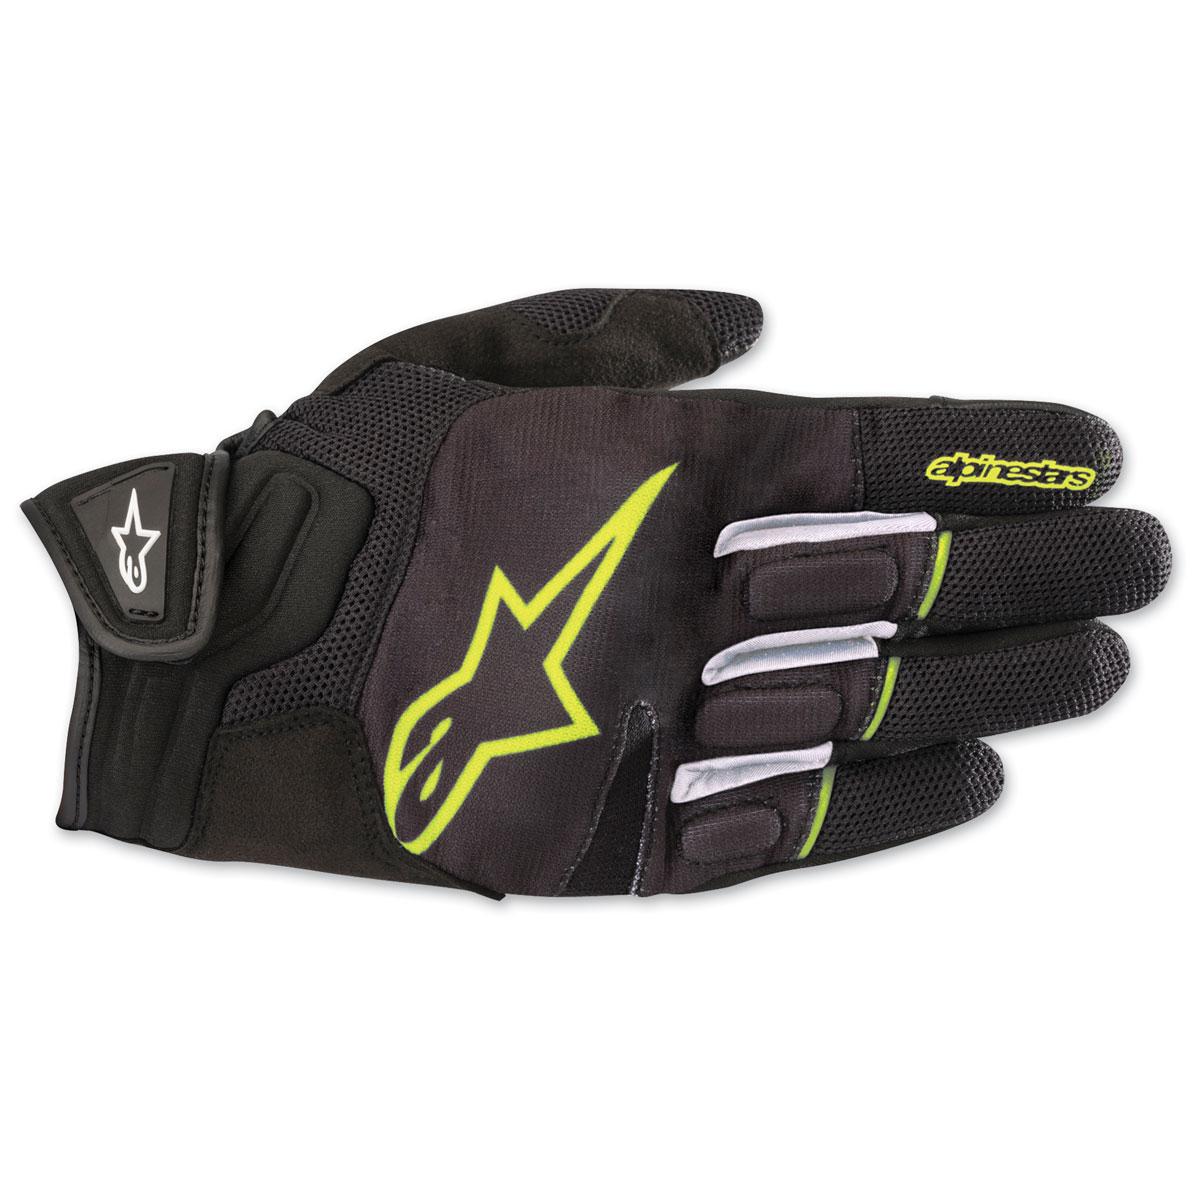 Alpinestars Men's Atom Black/Yellow Gloves